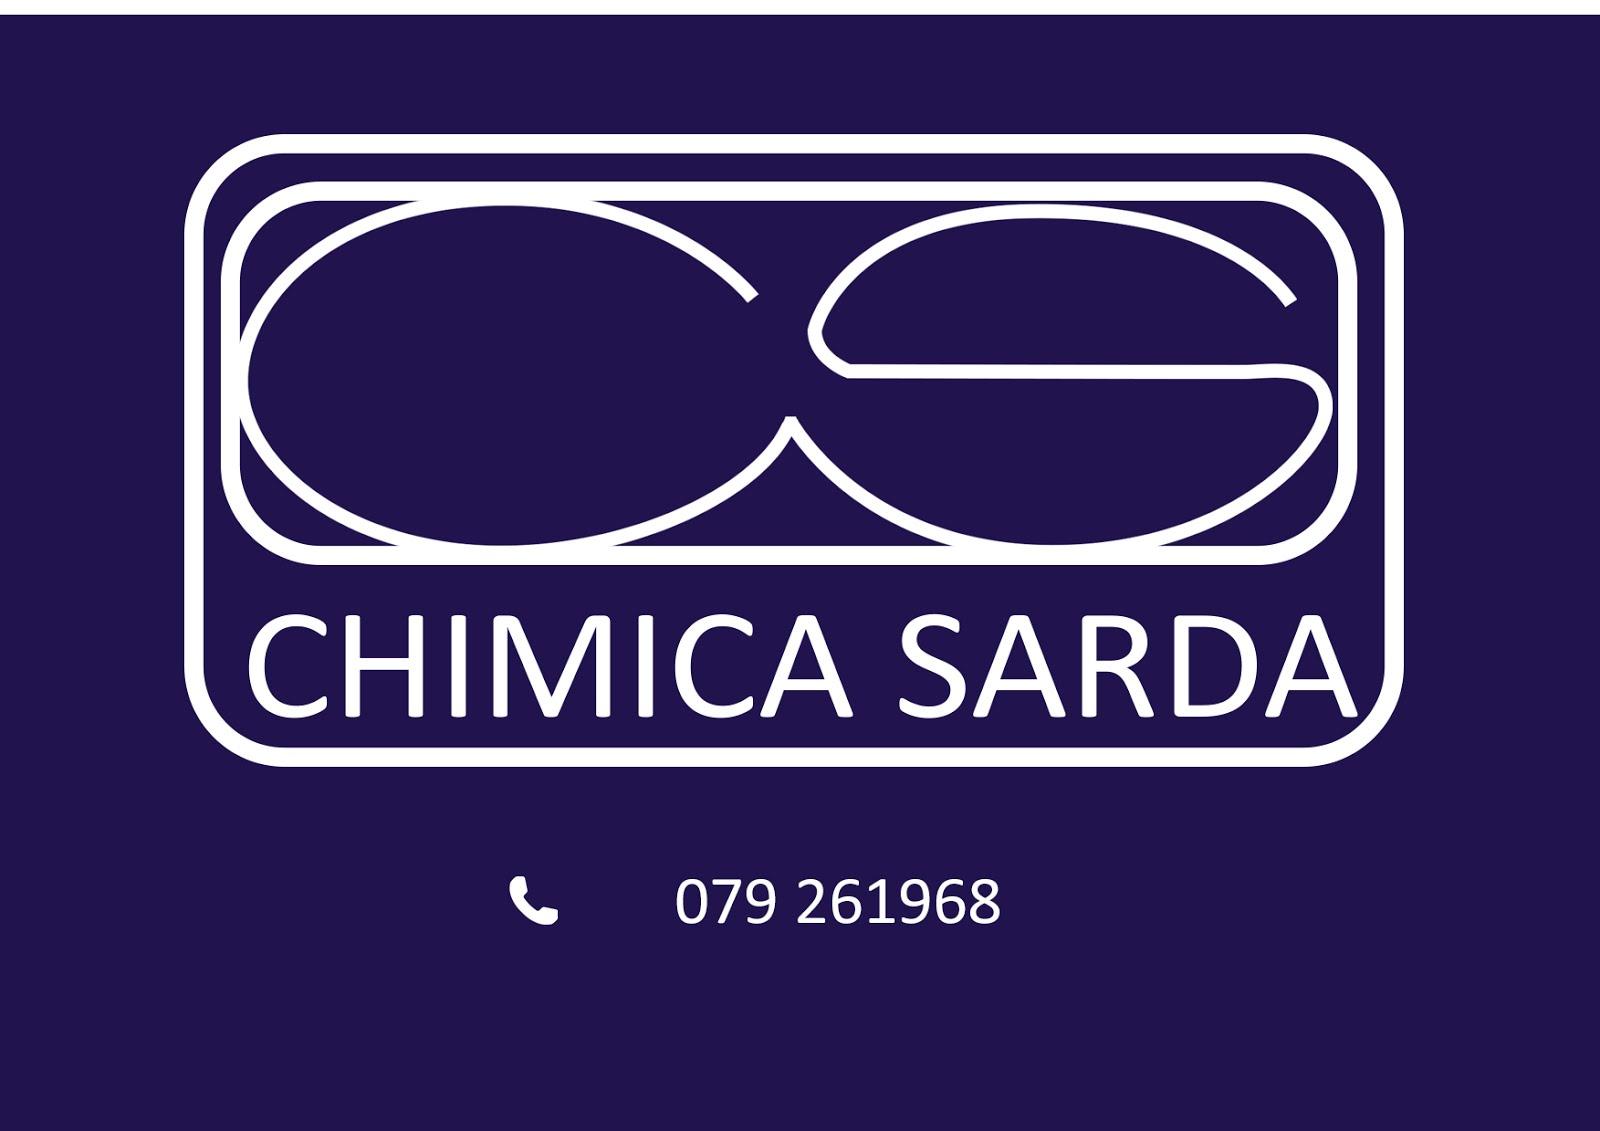 CHIMICA SARDA